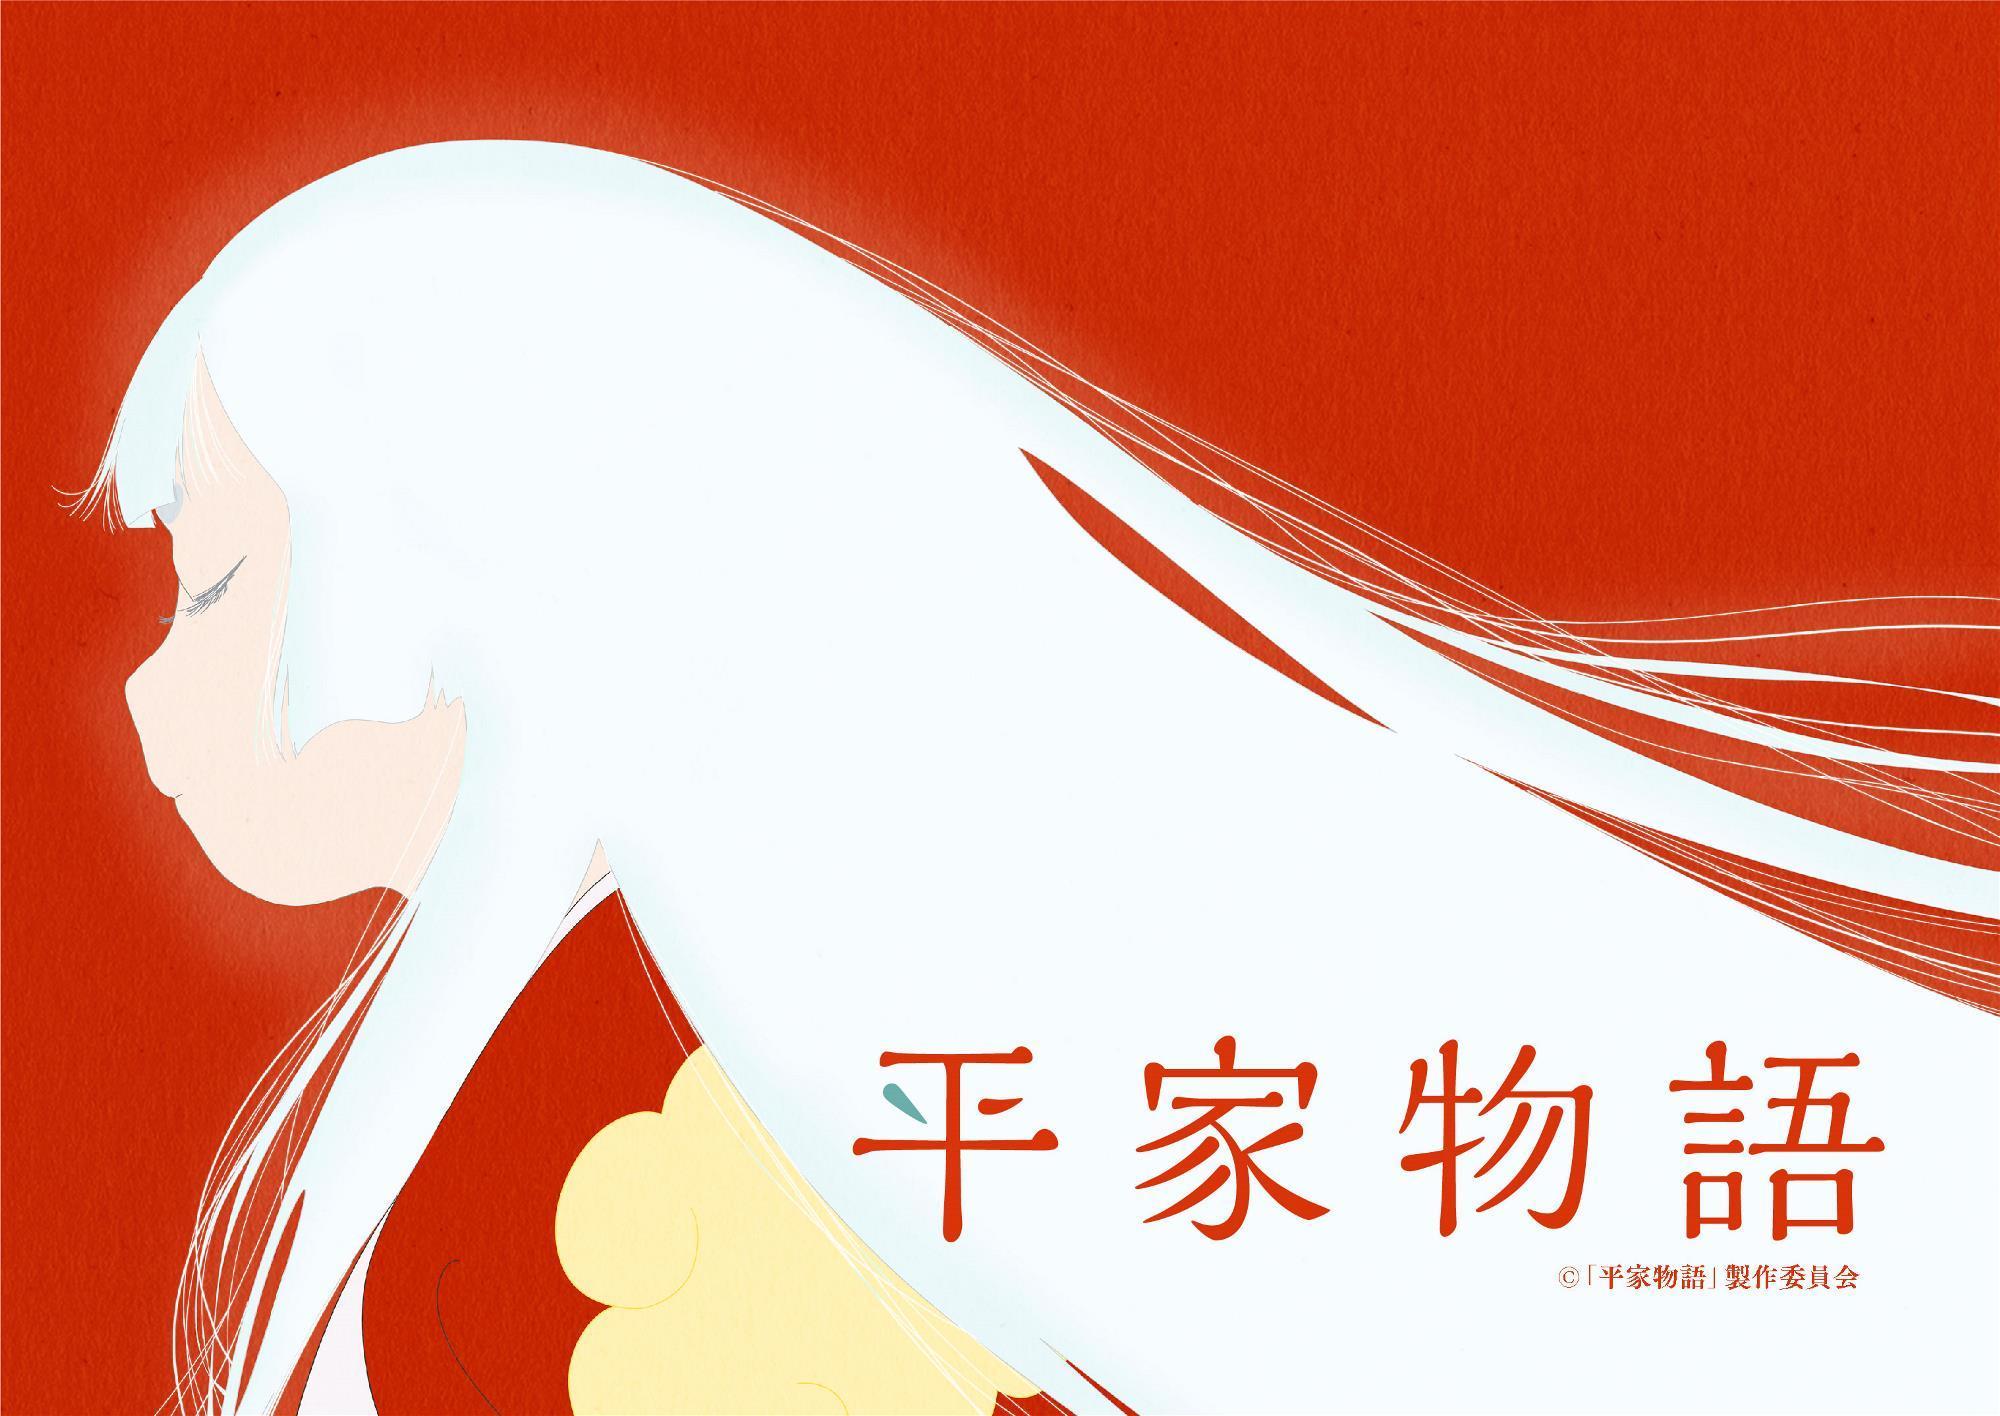 TVアニメ『平家物語』ティザービジュアル  (c)「平家物語」製作委員会